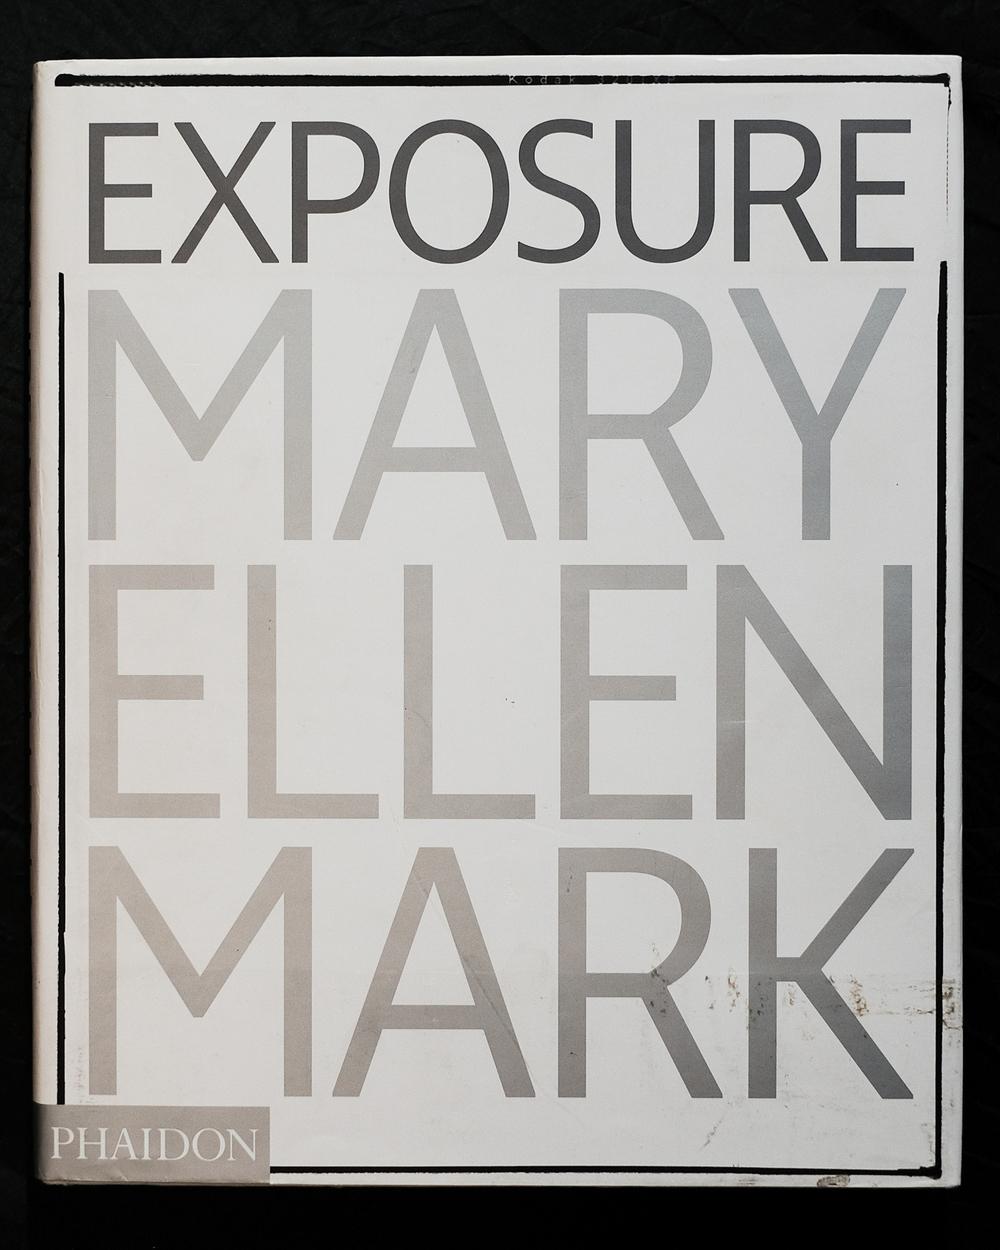 exposure-mary-ellen-mark.jpg